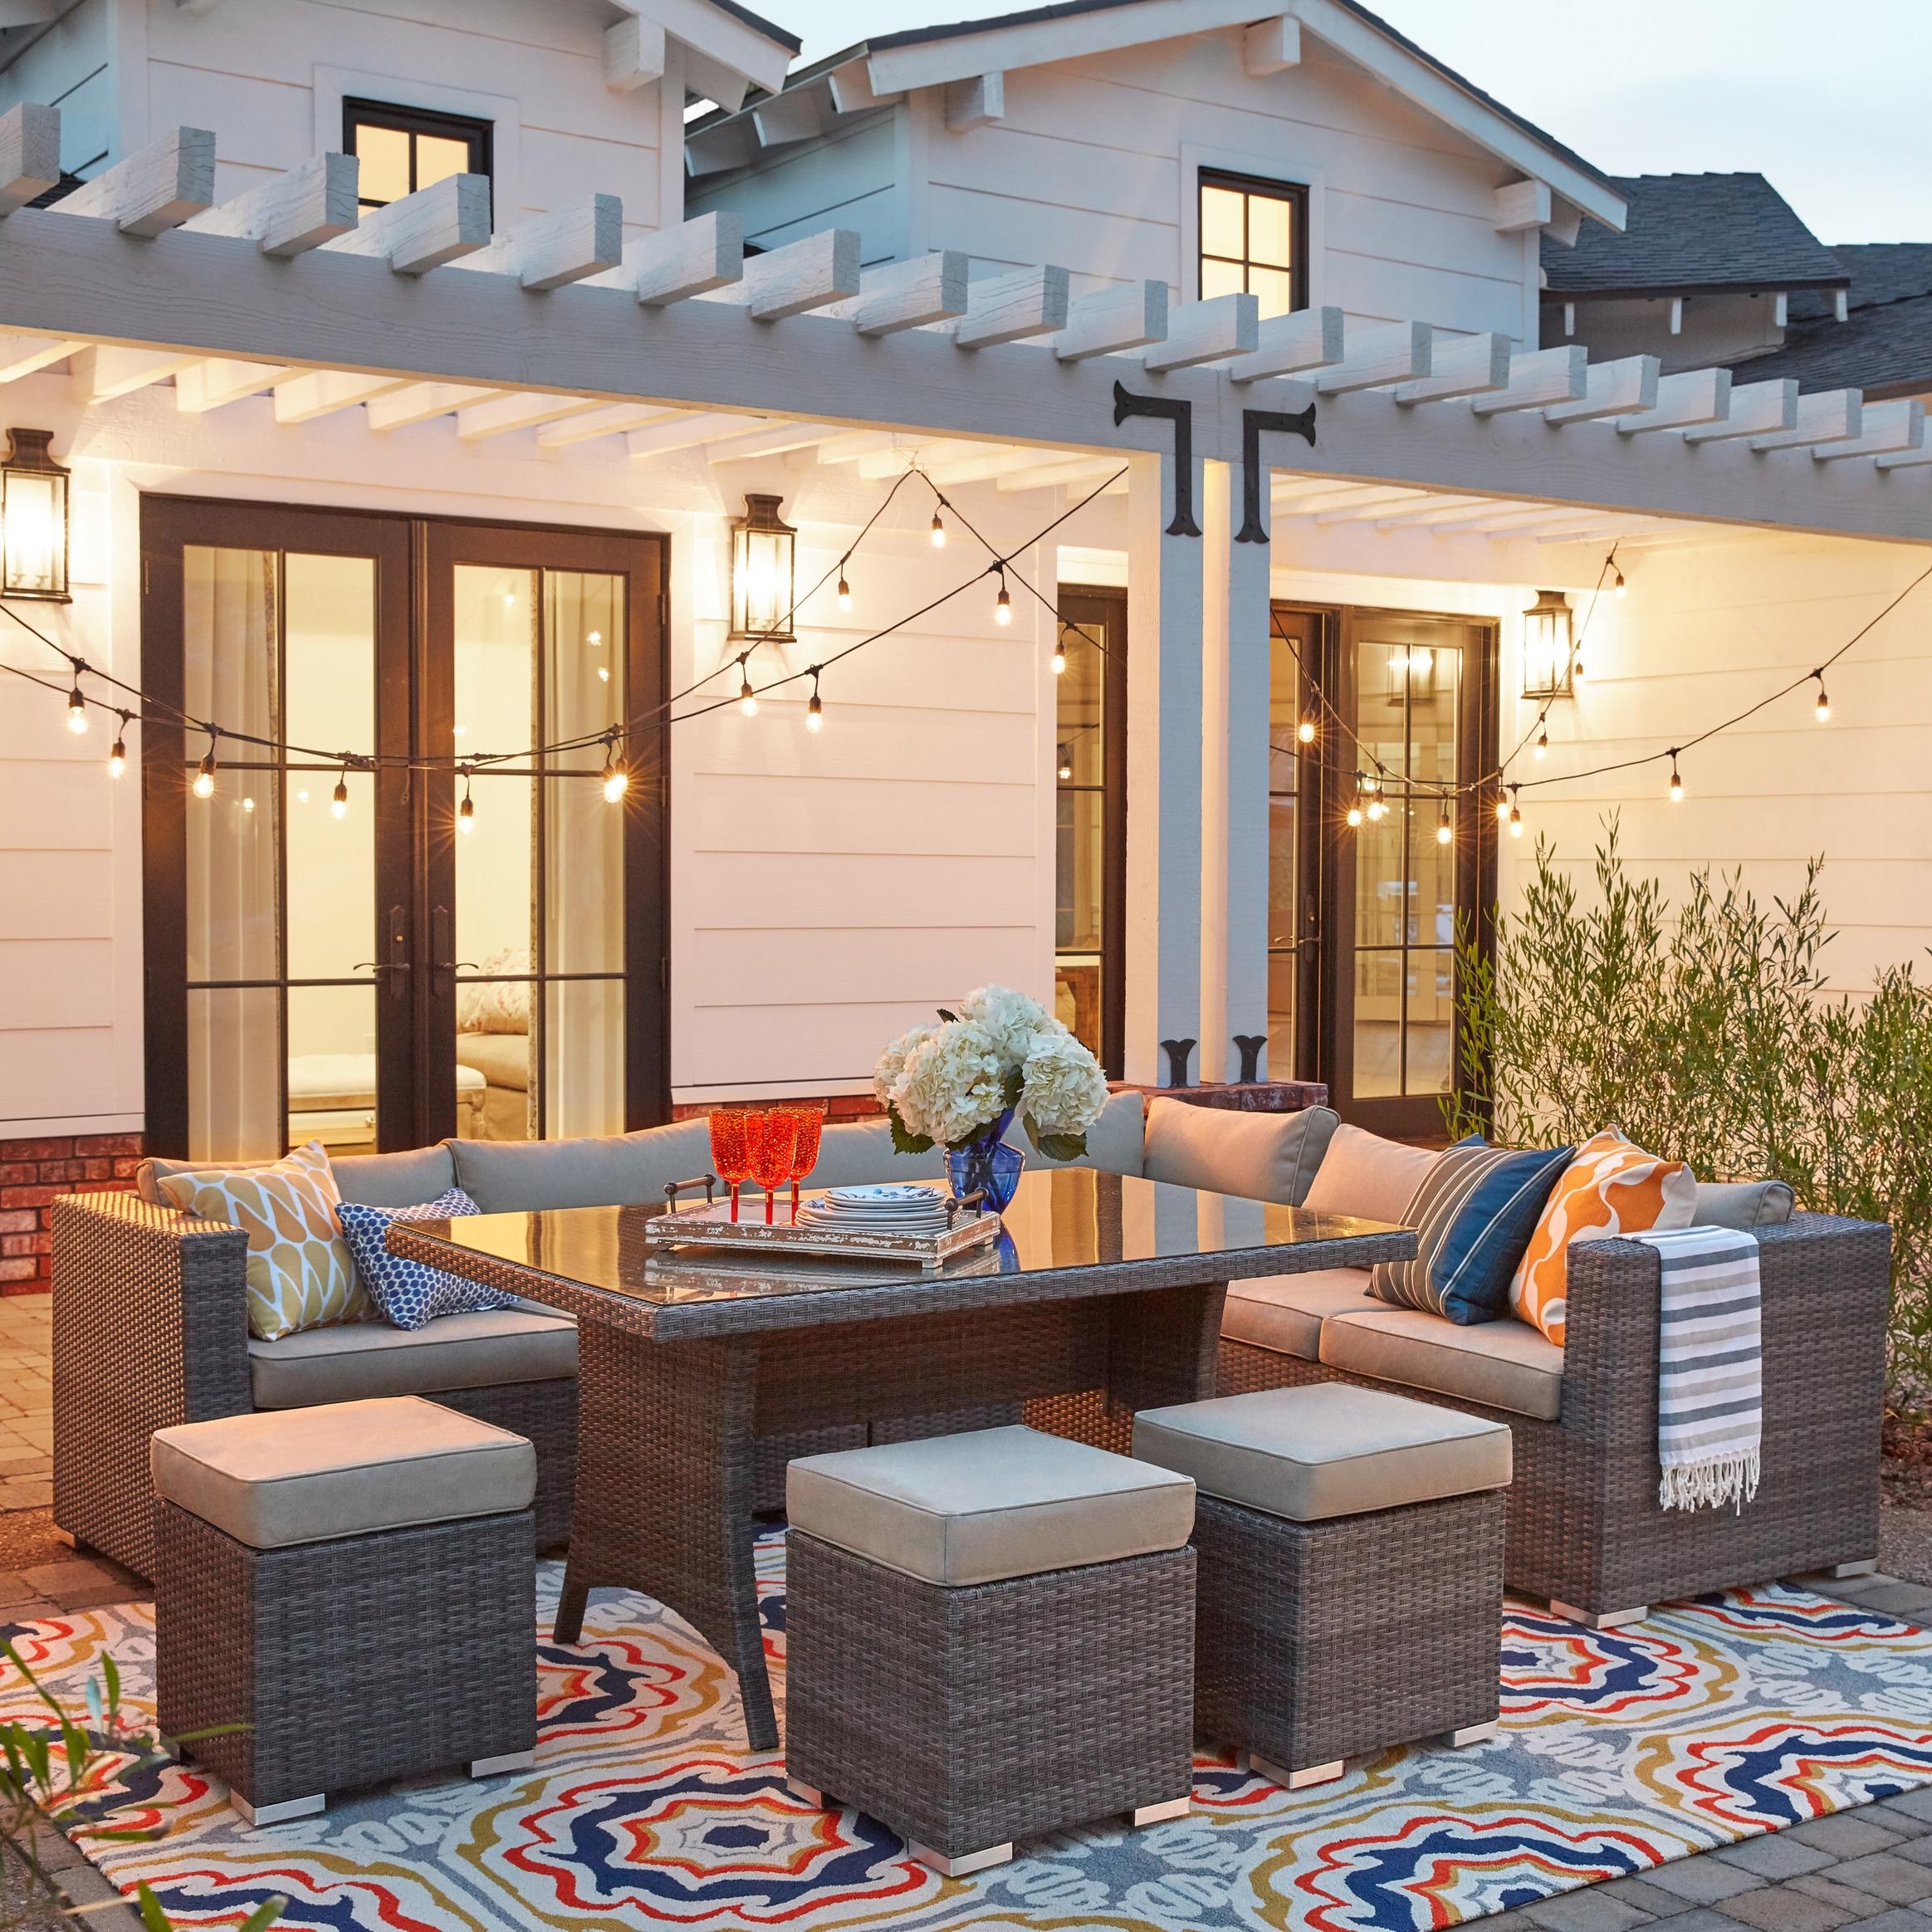 Nuloom Handmade Indoor Outdoor Spanish Tiles Multi Rug 5